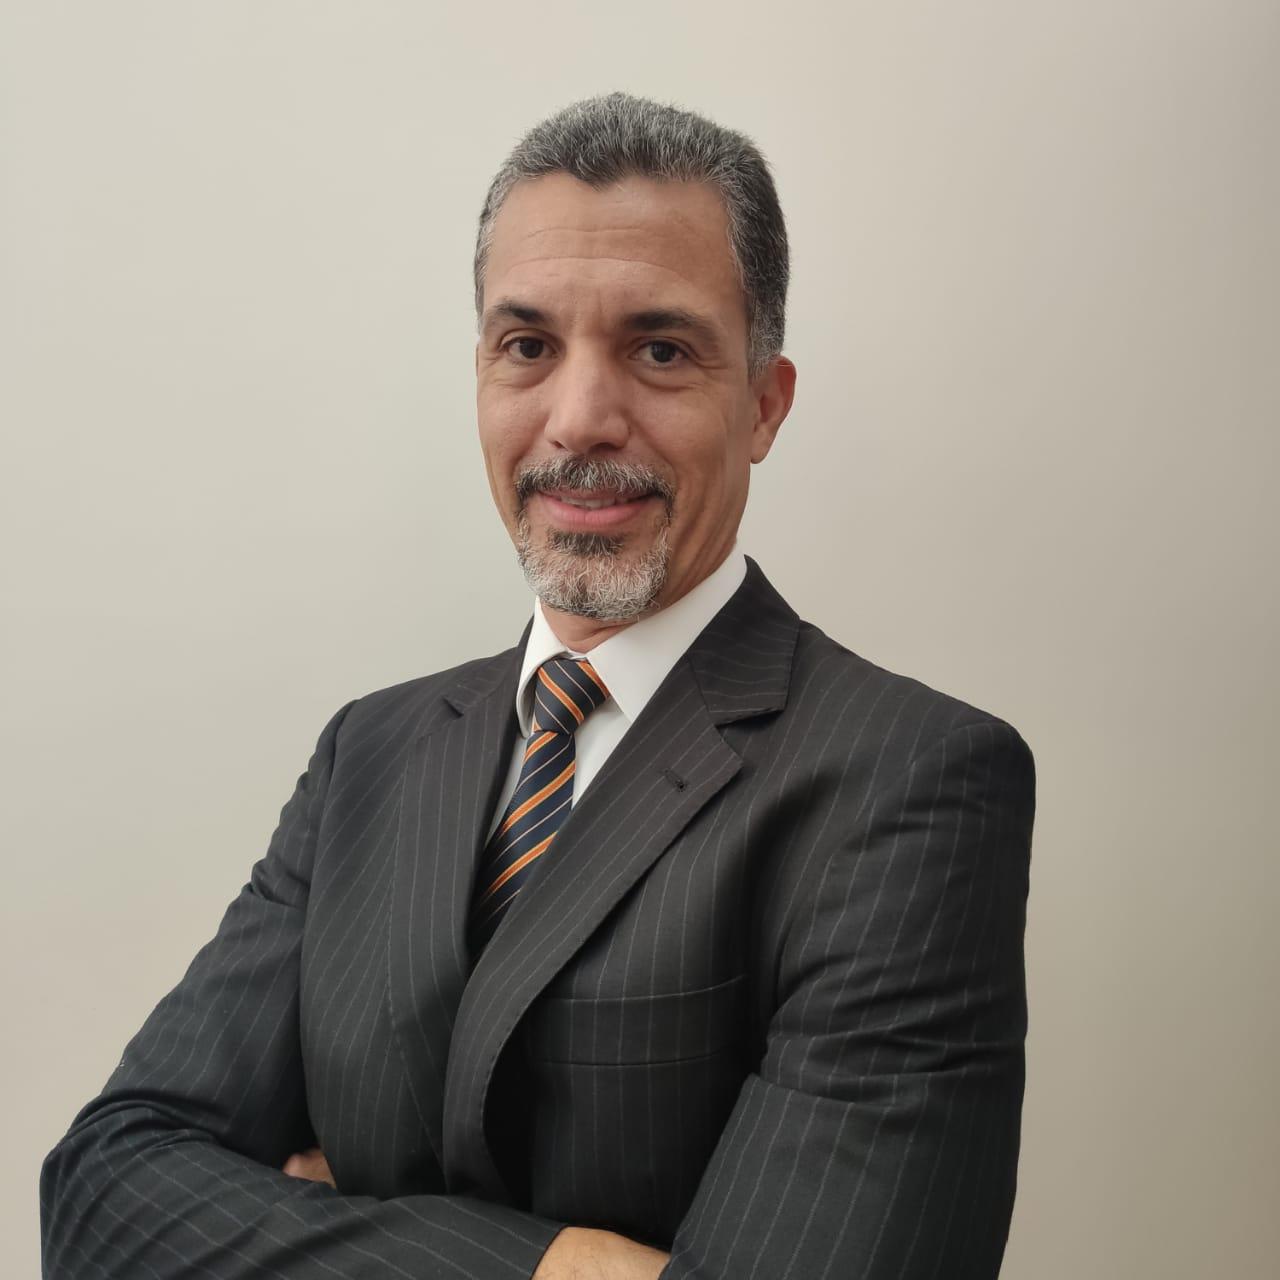 Colunista Glauco Roberto Marques Moreira